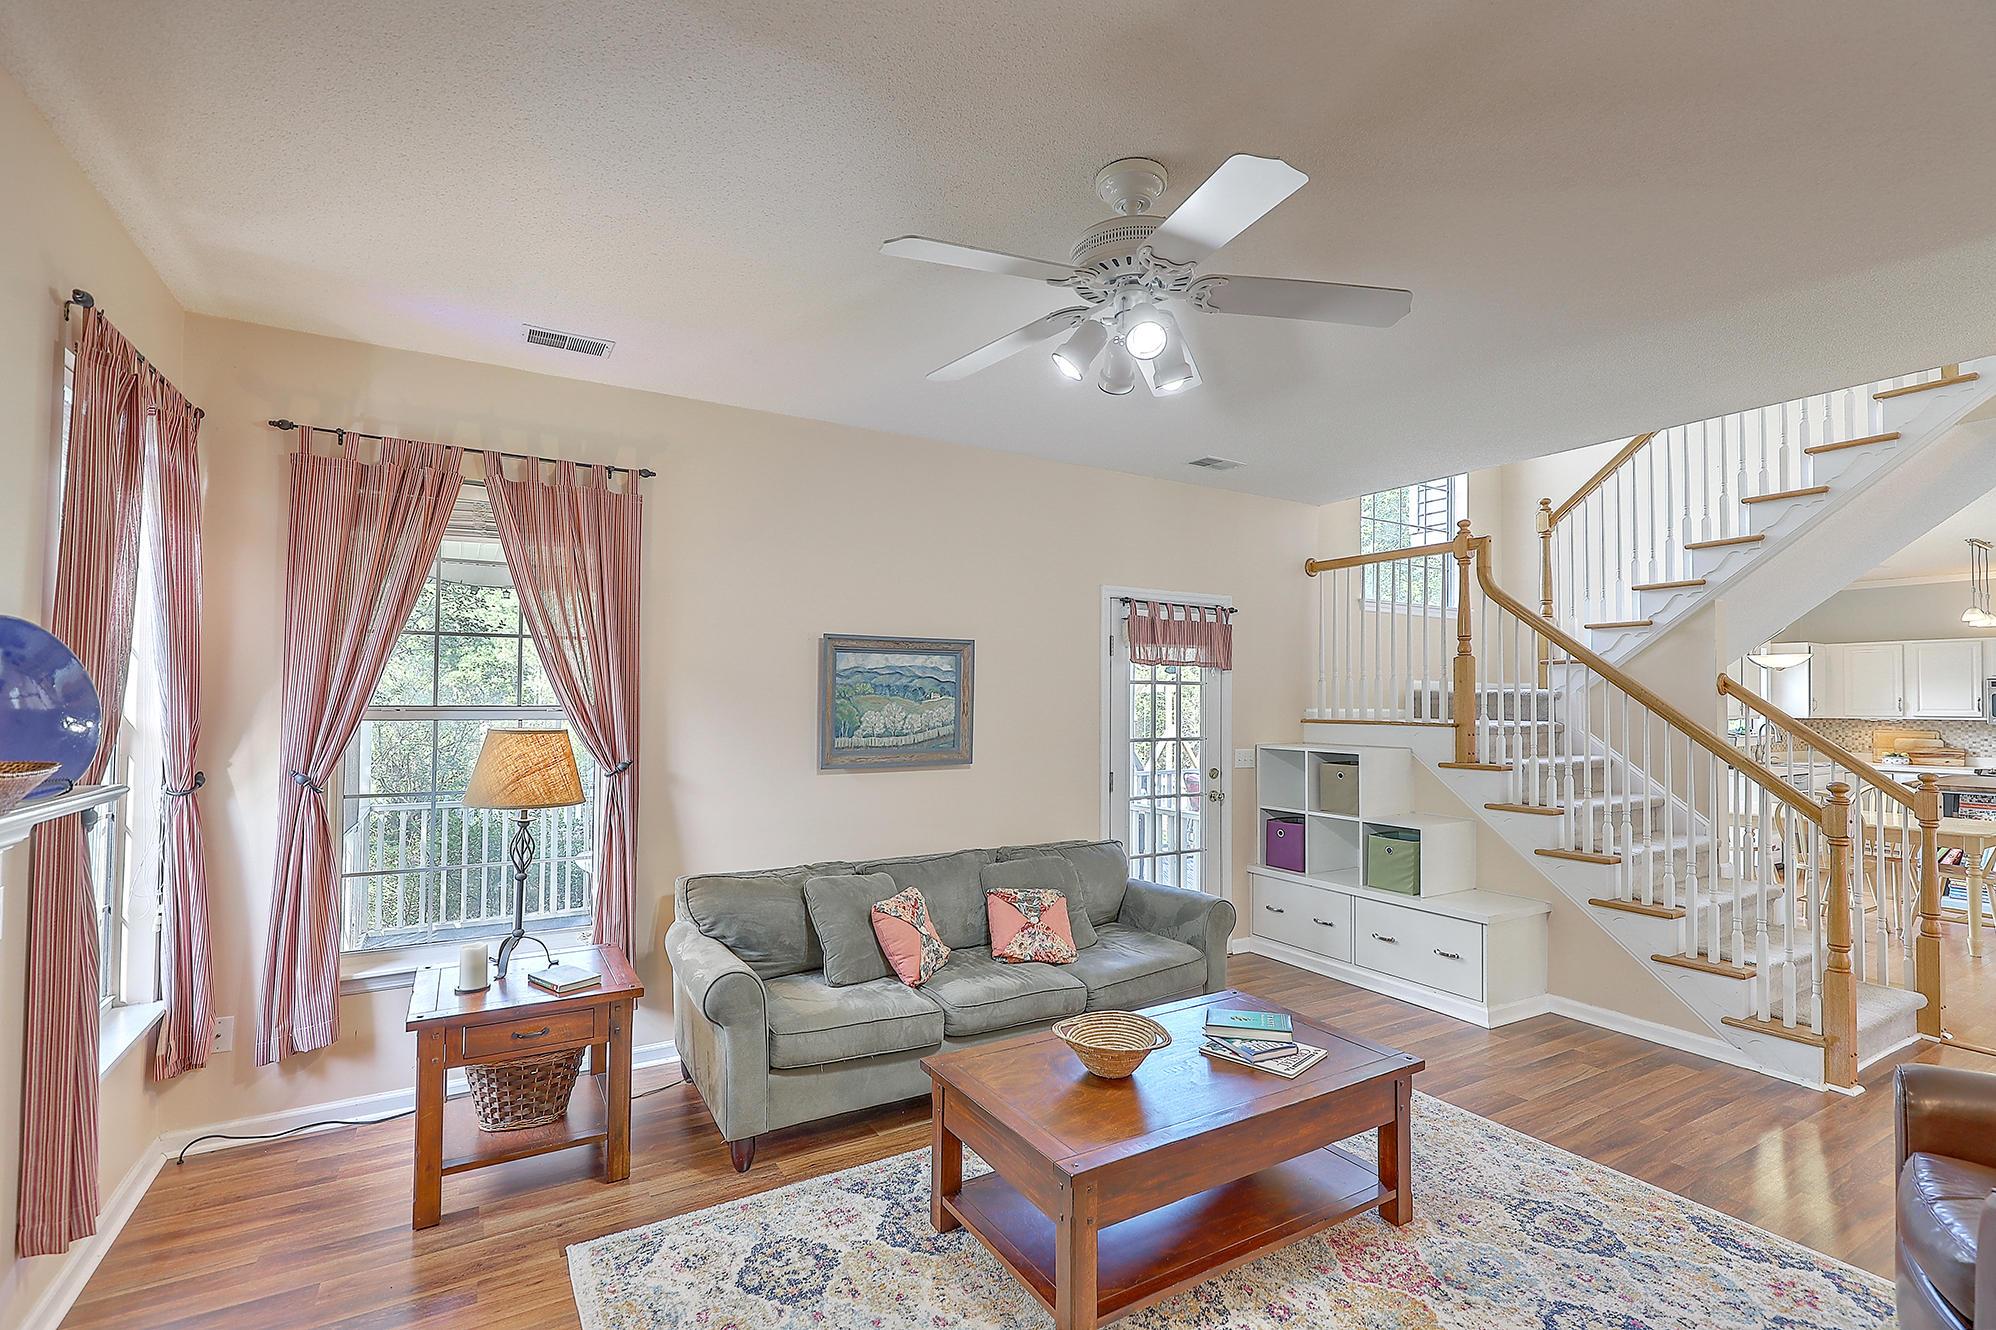 Belle Hall Homes For Sale - 106 Revolution, Mount Pleasant, SC - 35